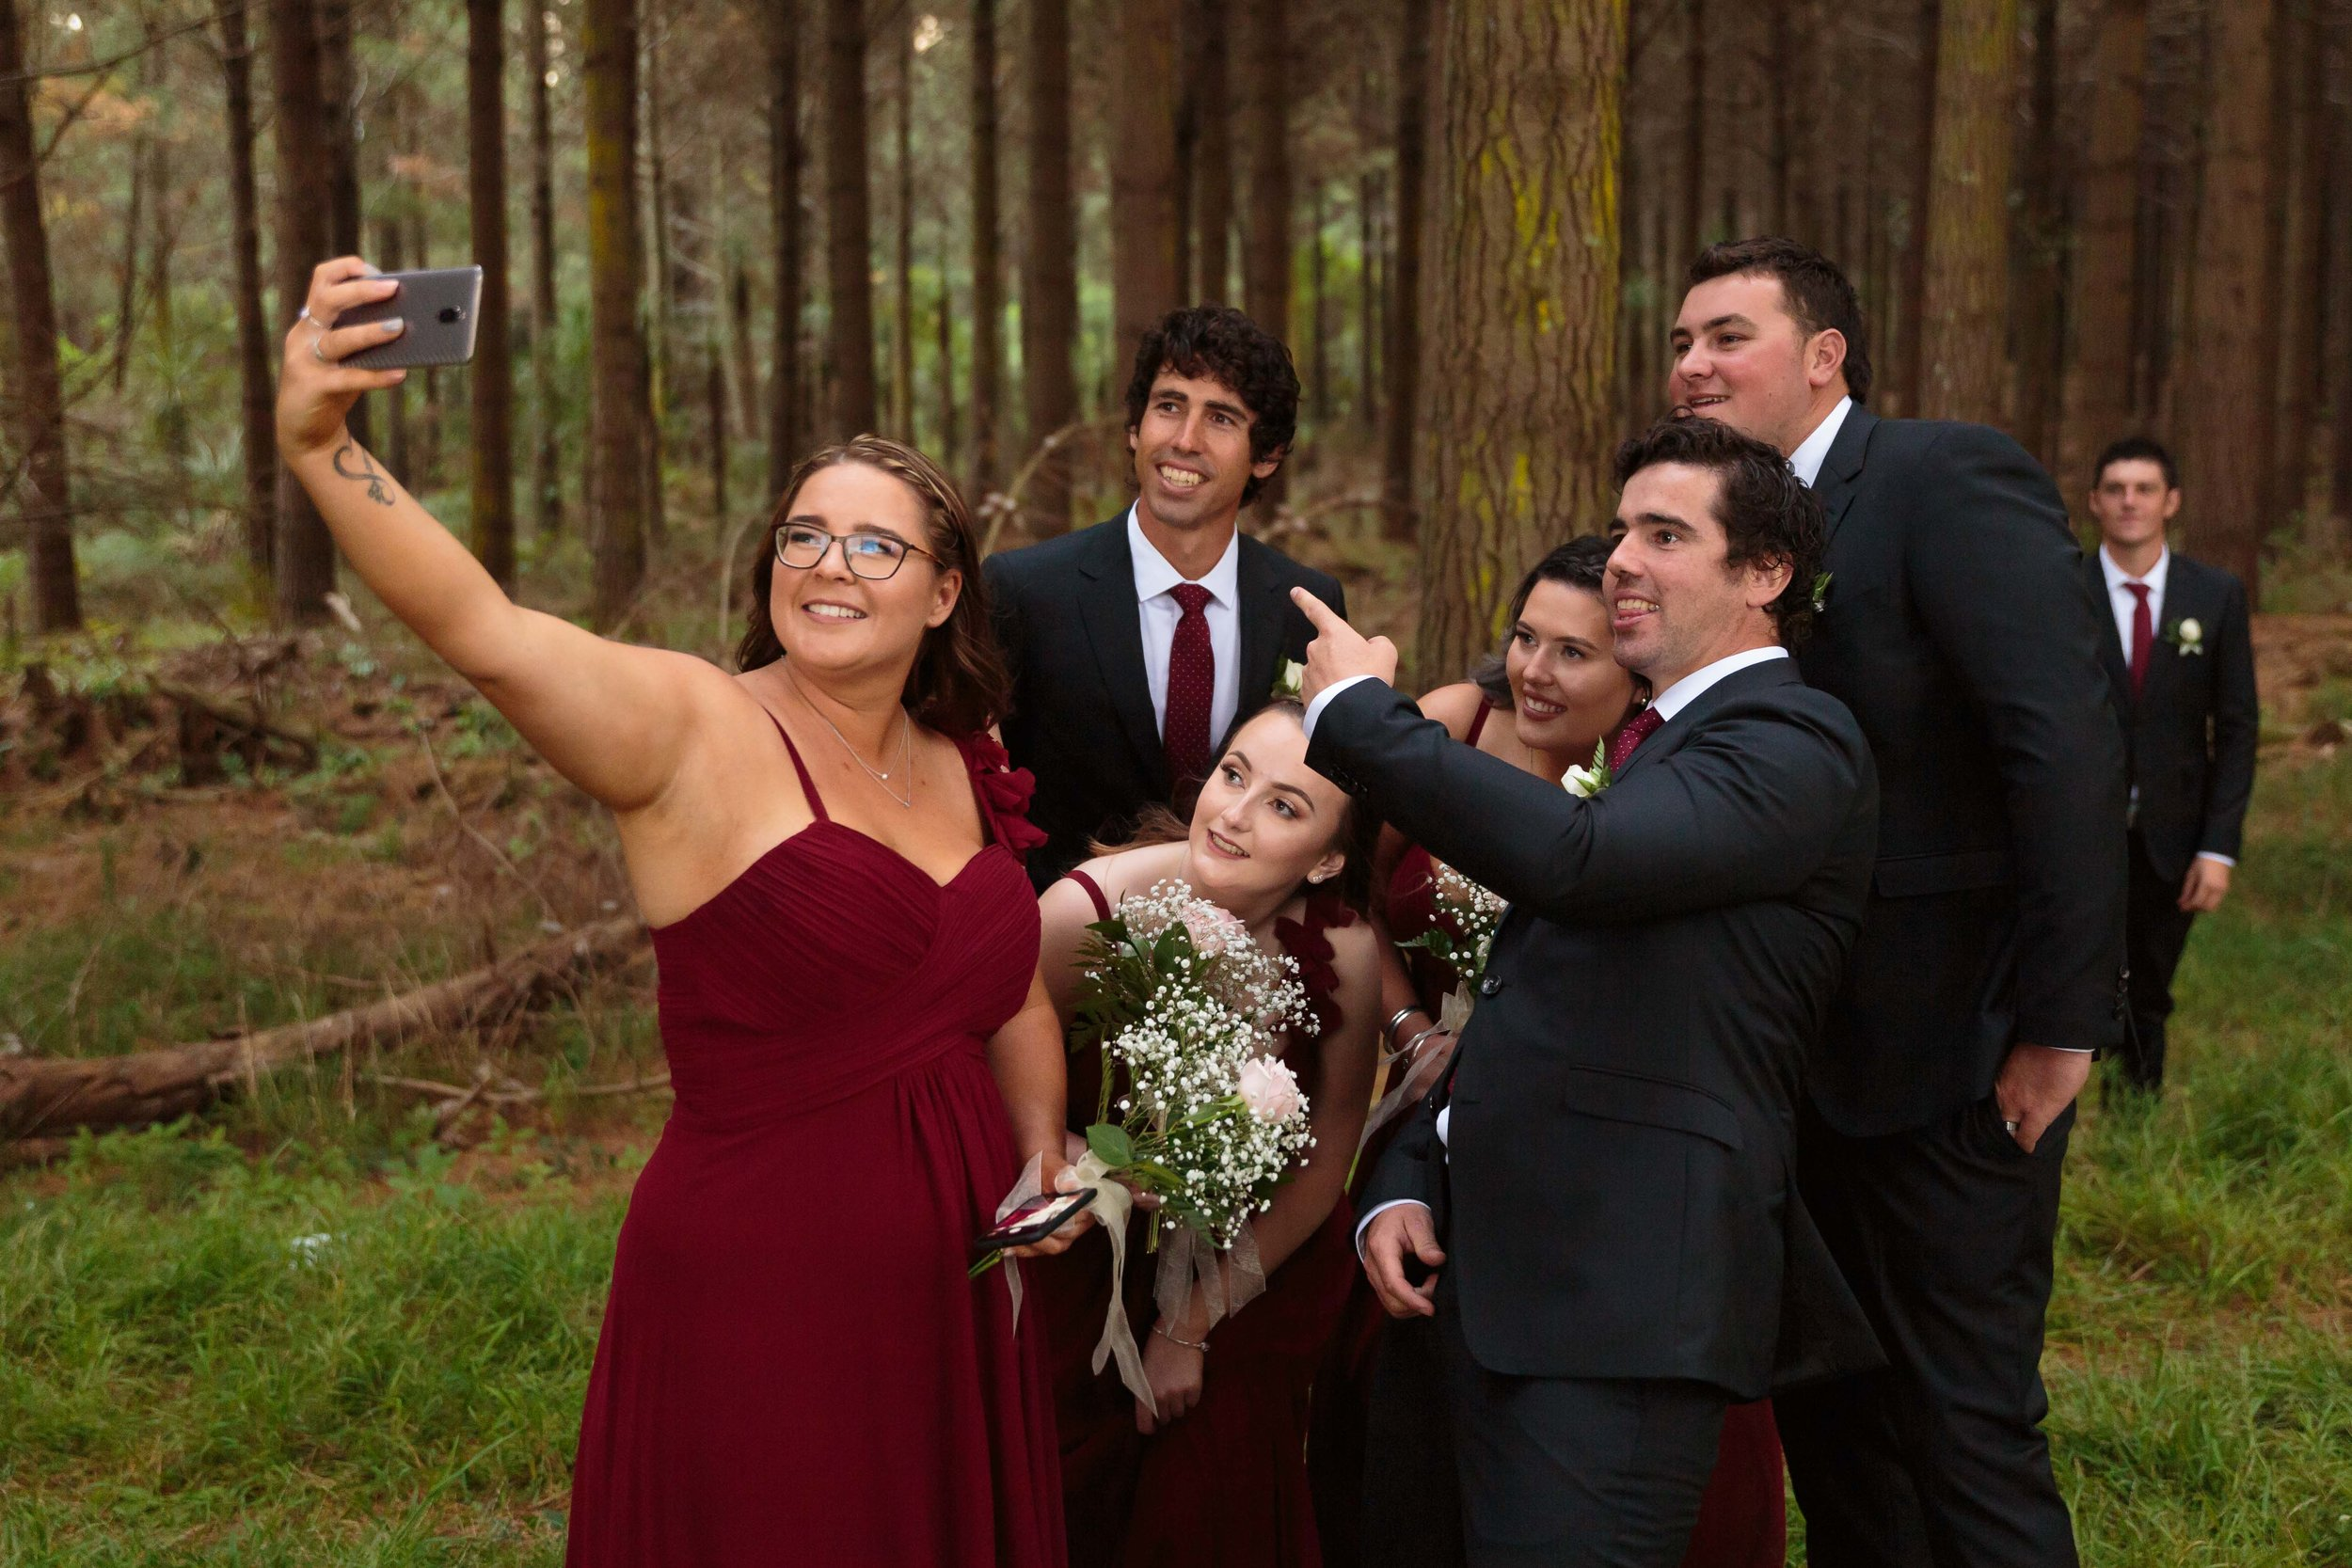 Highight-wedding-photography-dudding-lake-palmerston-north-new-zealand-70.jpg